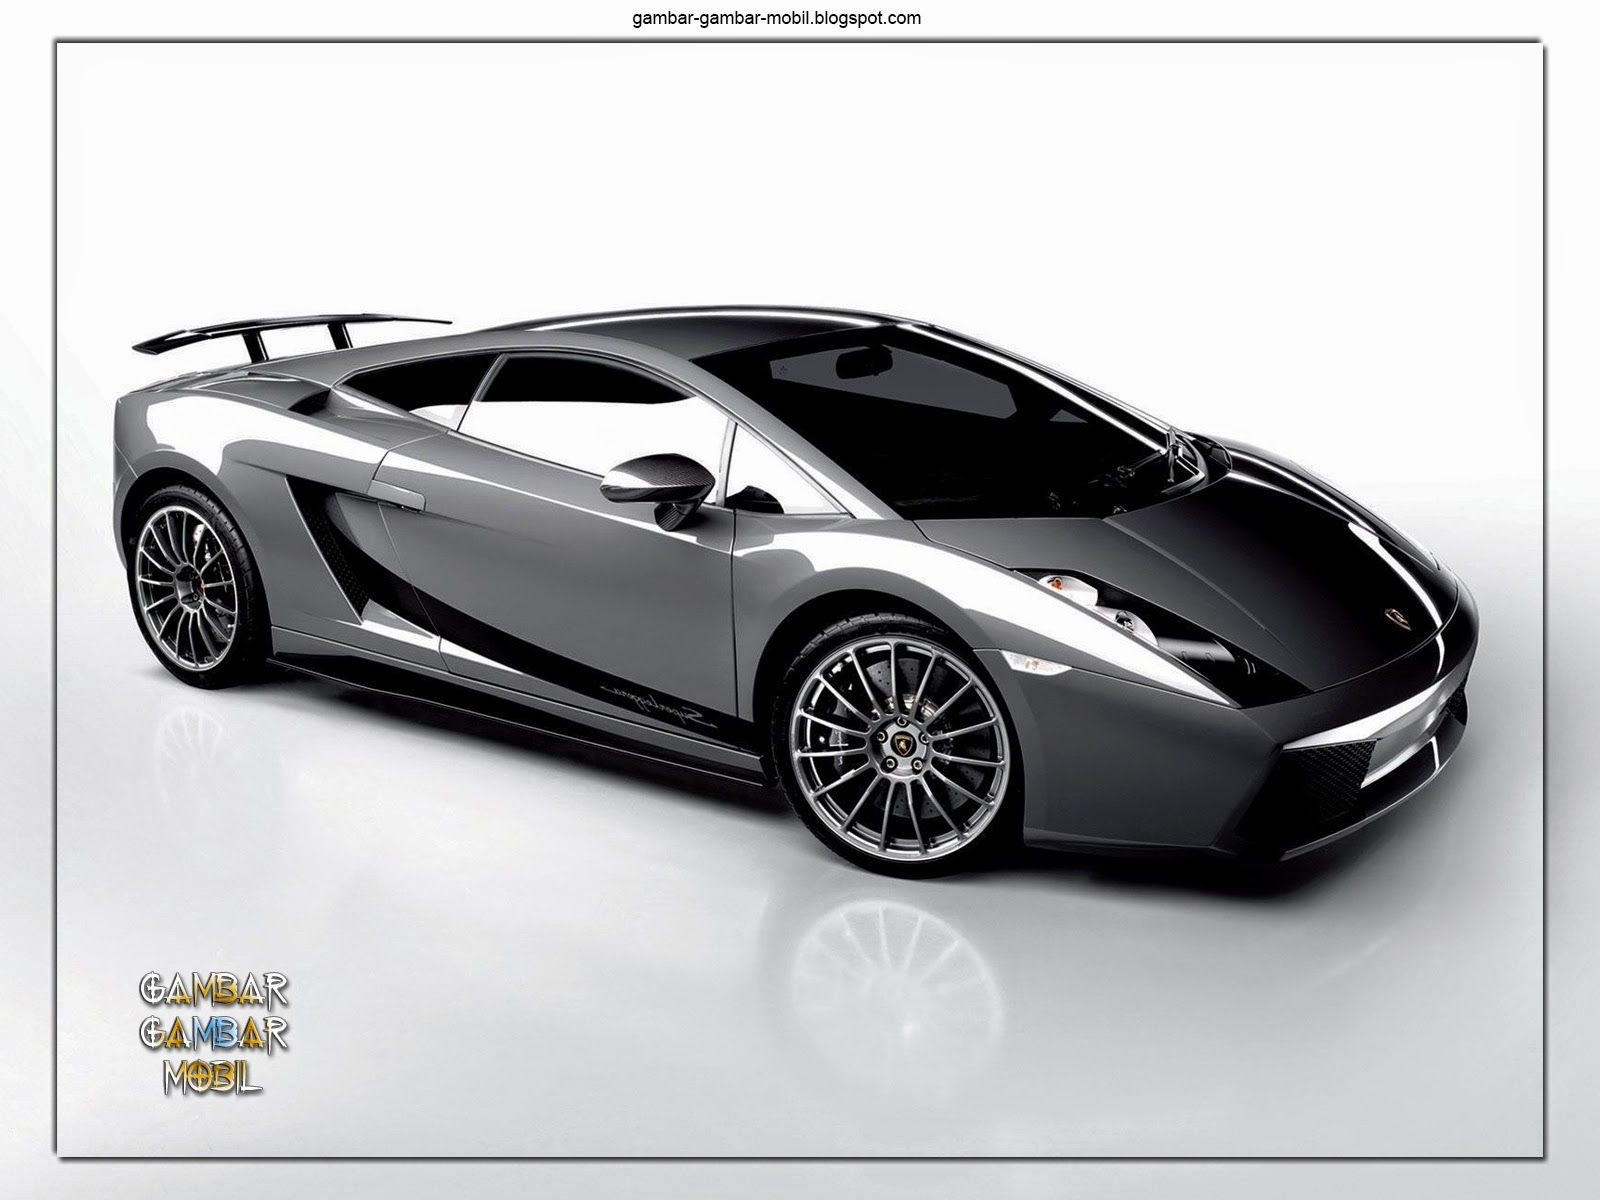 Foto Mobil Balap Lamborghini Gallardo